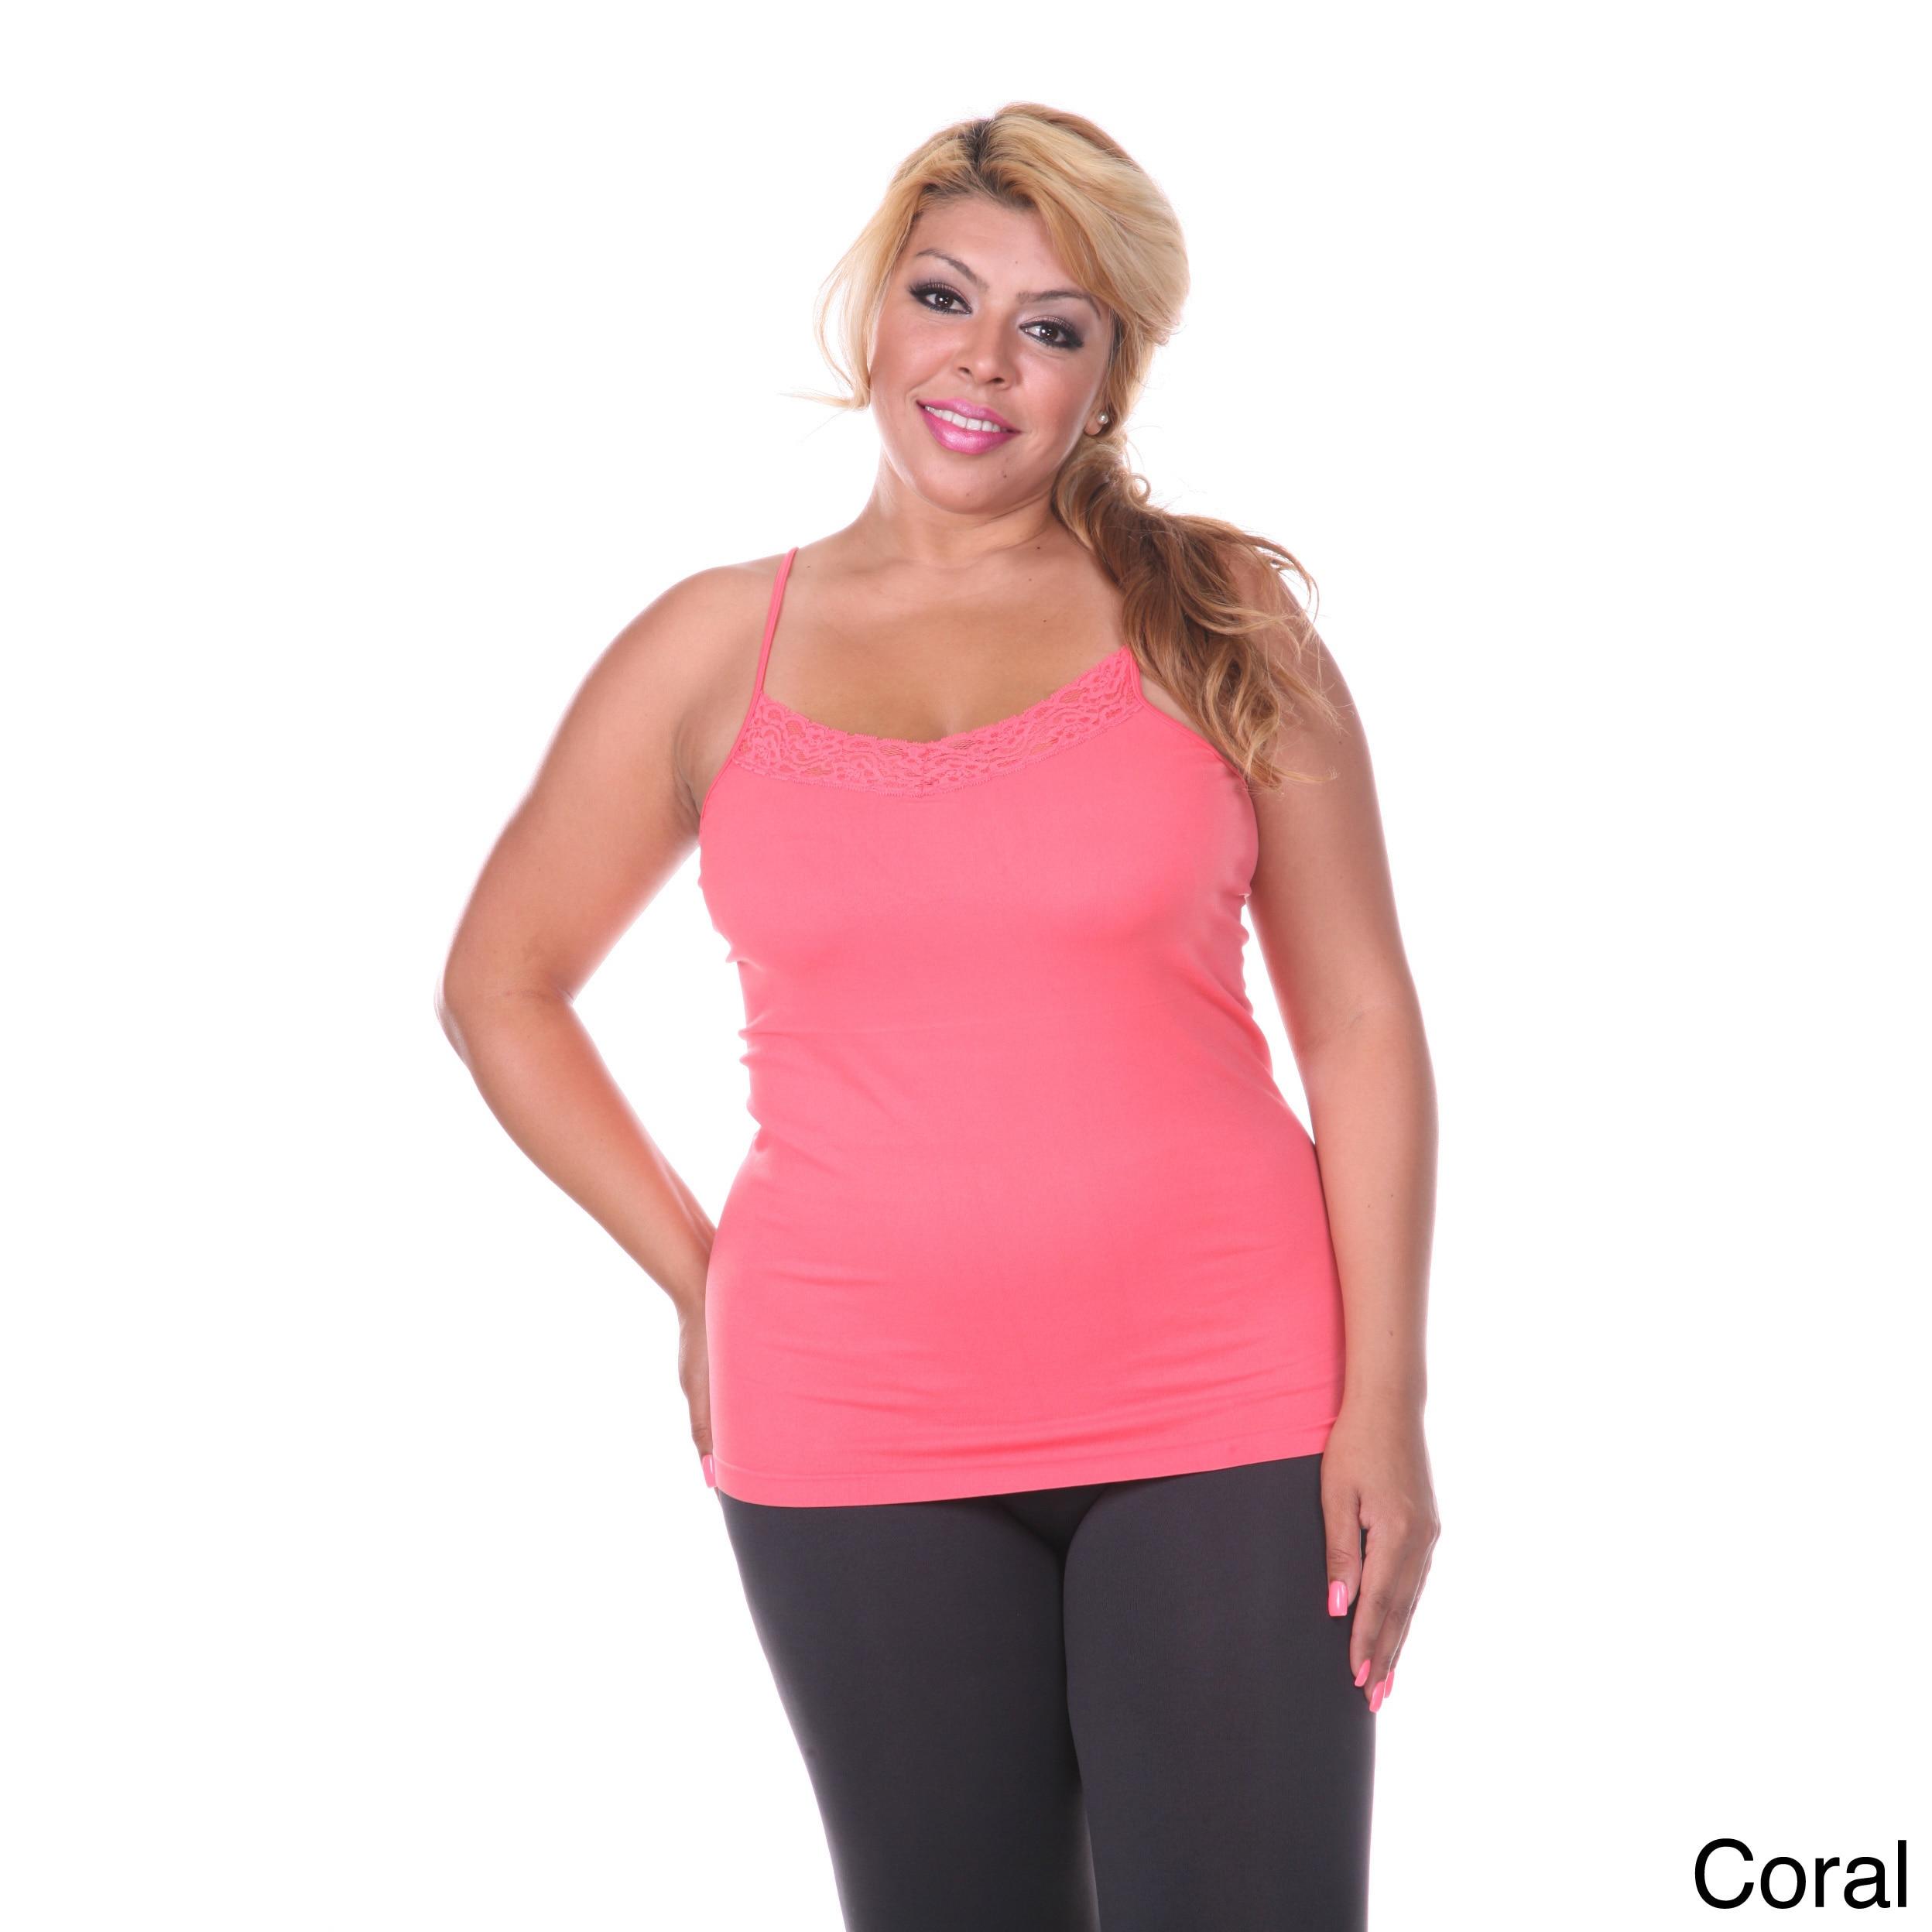 Overstock.com White Mark Women's Plus Size Lace Trim Cami at Sears.com